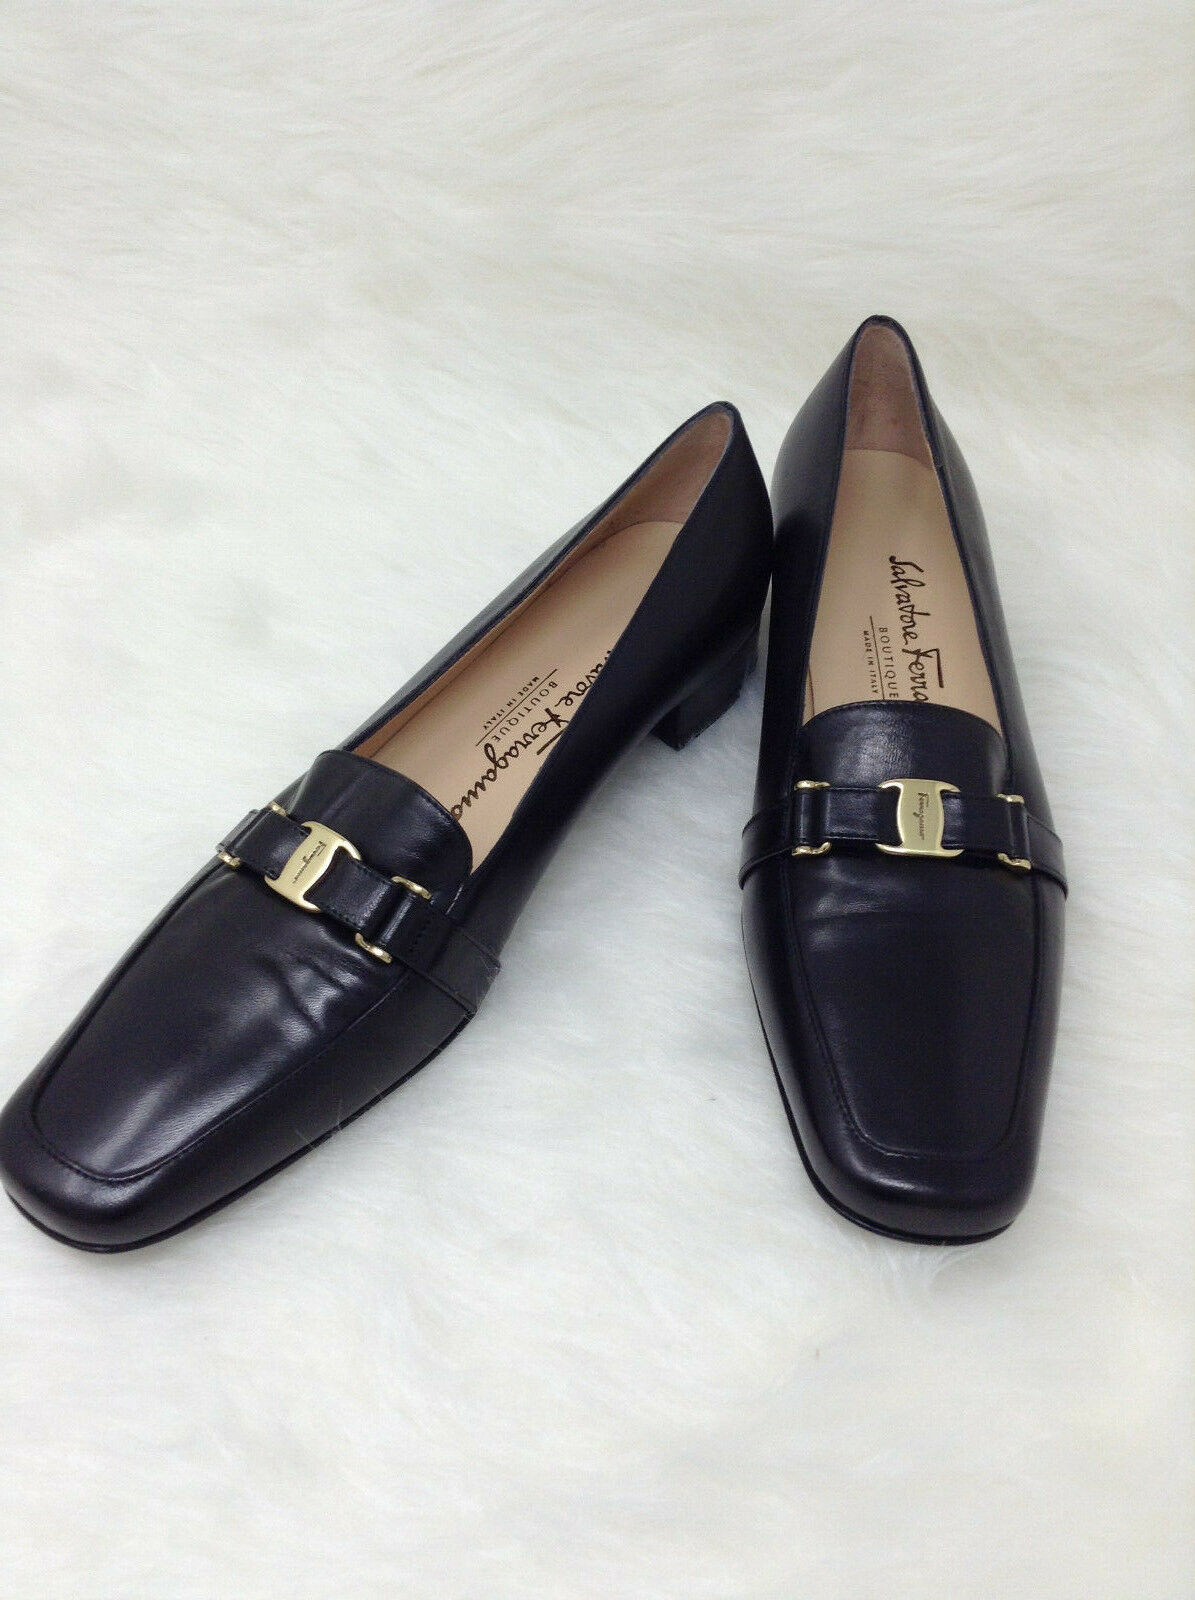 NEW, Salvatore Ferragamo Black Ladies Loafers, Sz 8 1 2 2 2 AAA 45e6b8